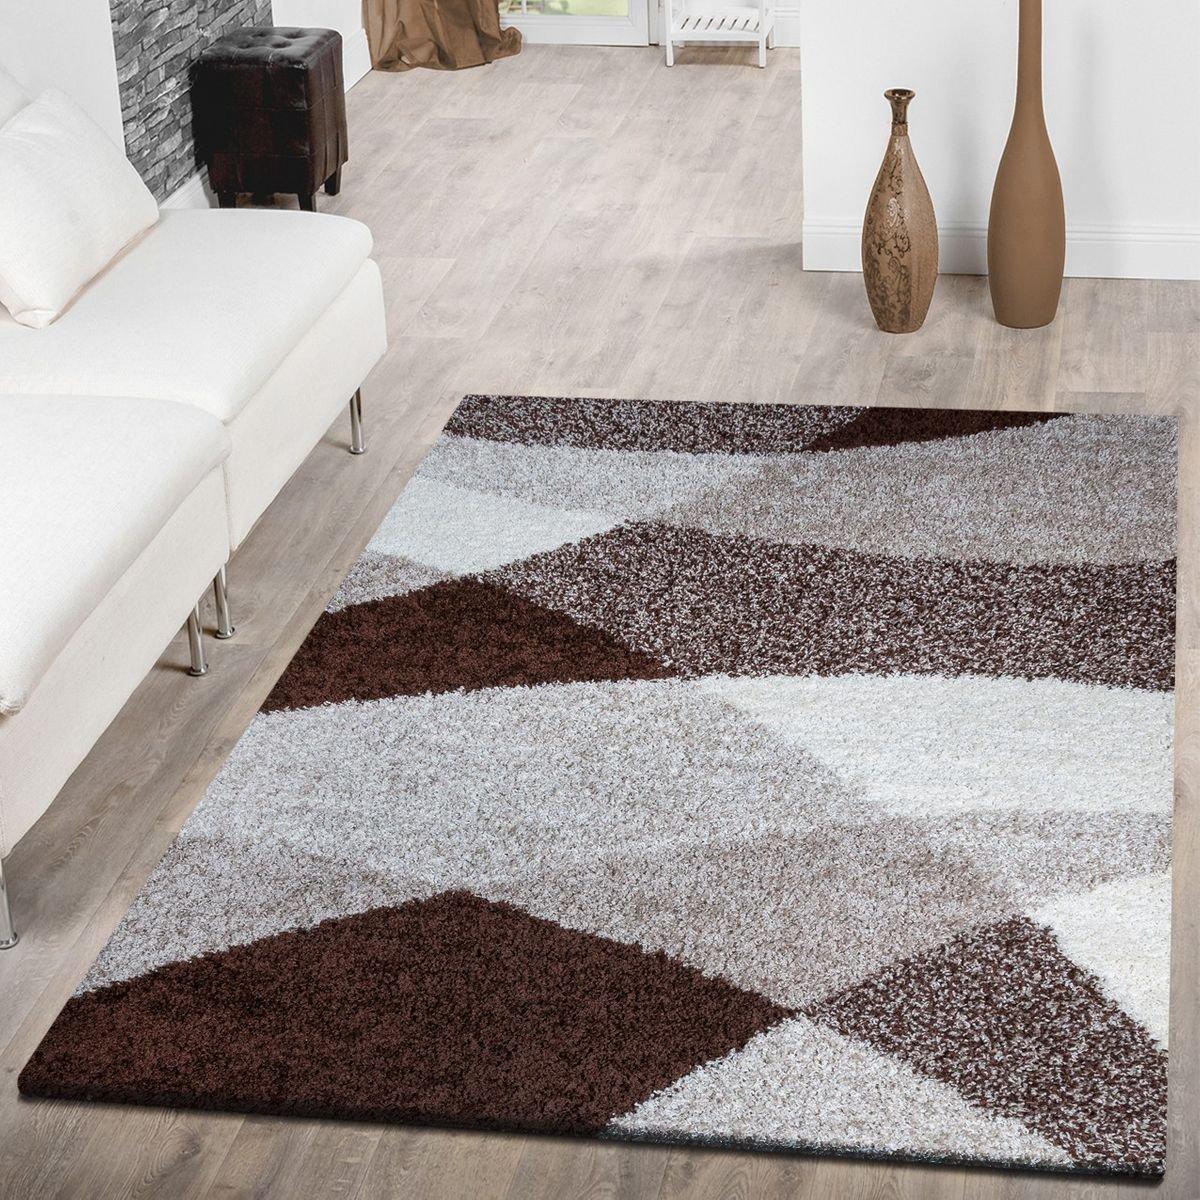 T&T Design Shaggy Shaggy Shaggy Teppich Hochflor Moderne Teppiche Geometrisch Gemustert in versch. Farben, Größe 200x280 cm, Farbe grau B076FCWDTH Teppiche 4f71e3